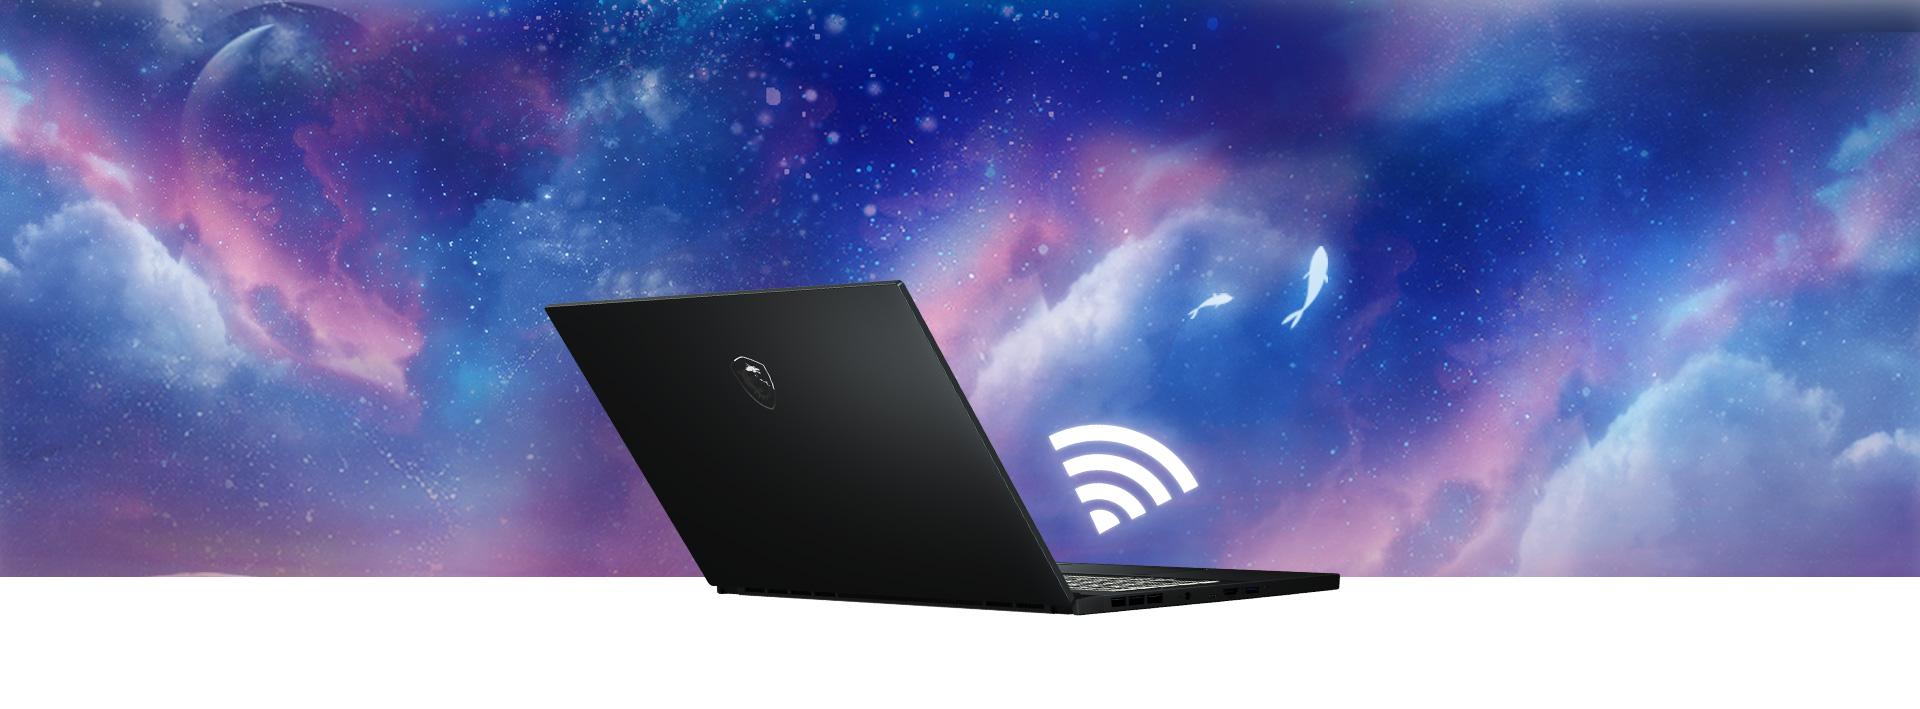 creator 15 wifi 6E